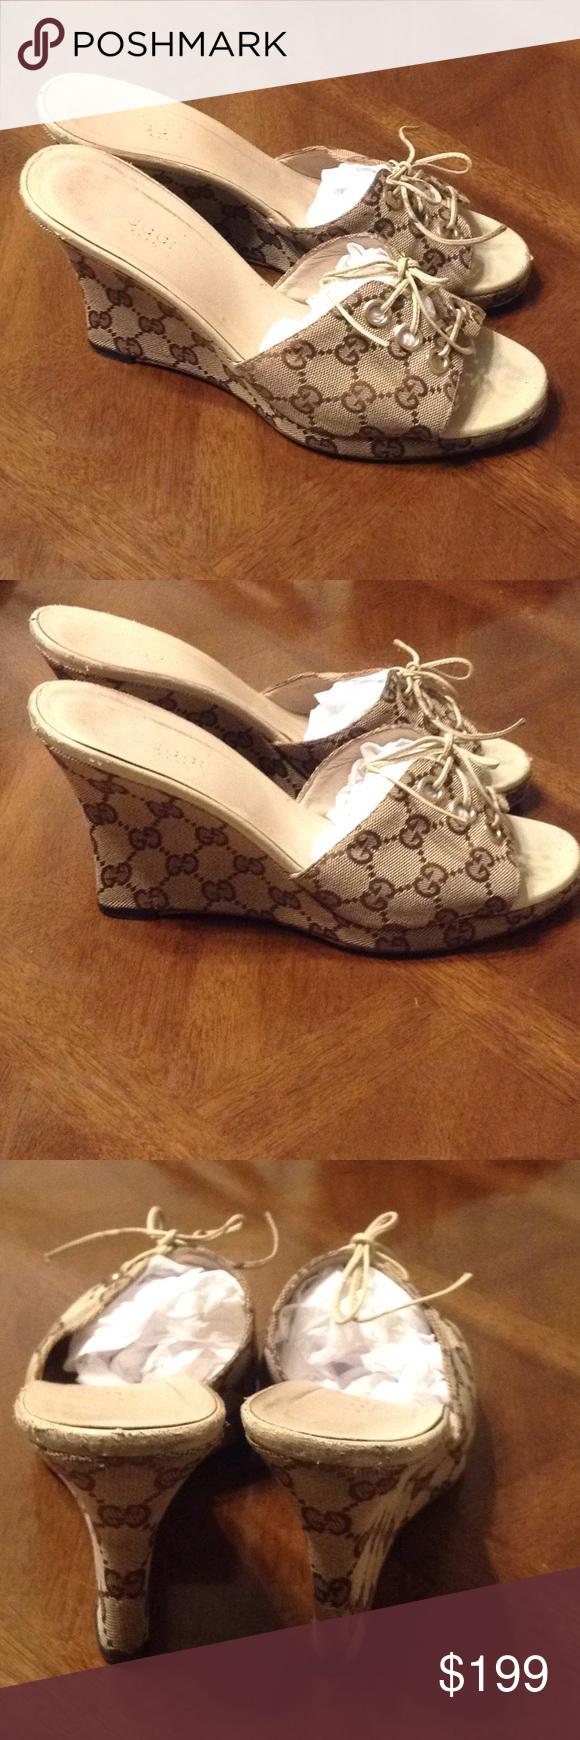 43312e0fb7c87 Gucci size 8 beige monogram wedges Gucci Women's Wedge Sandal Size 8 ...